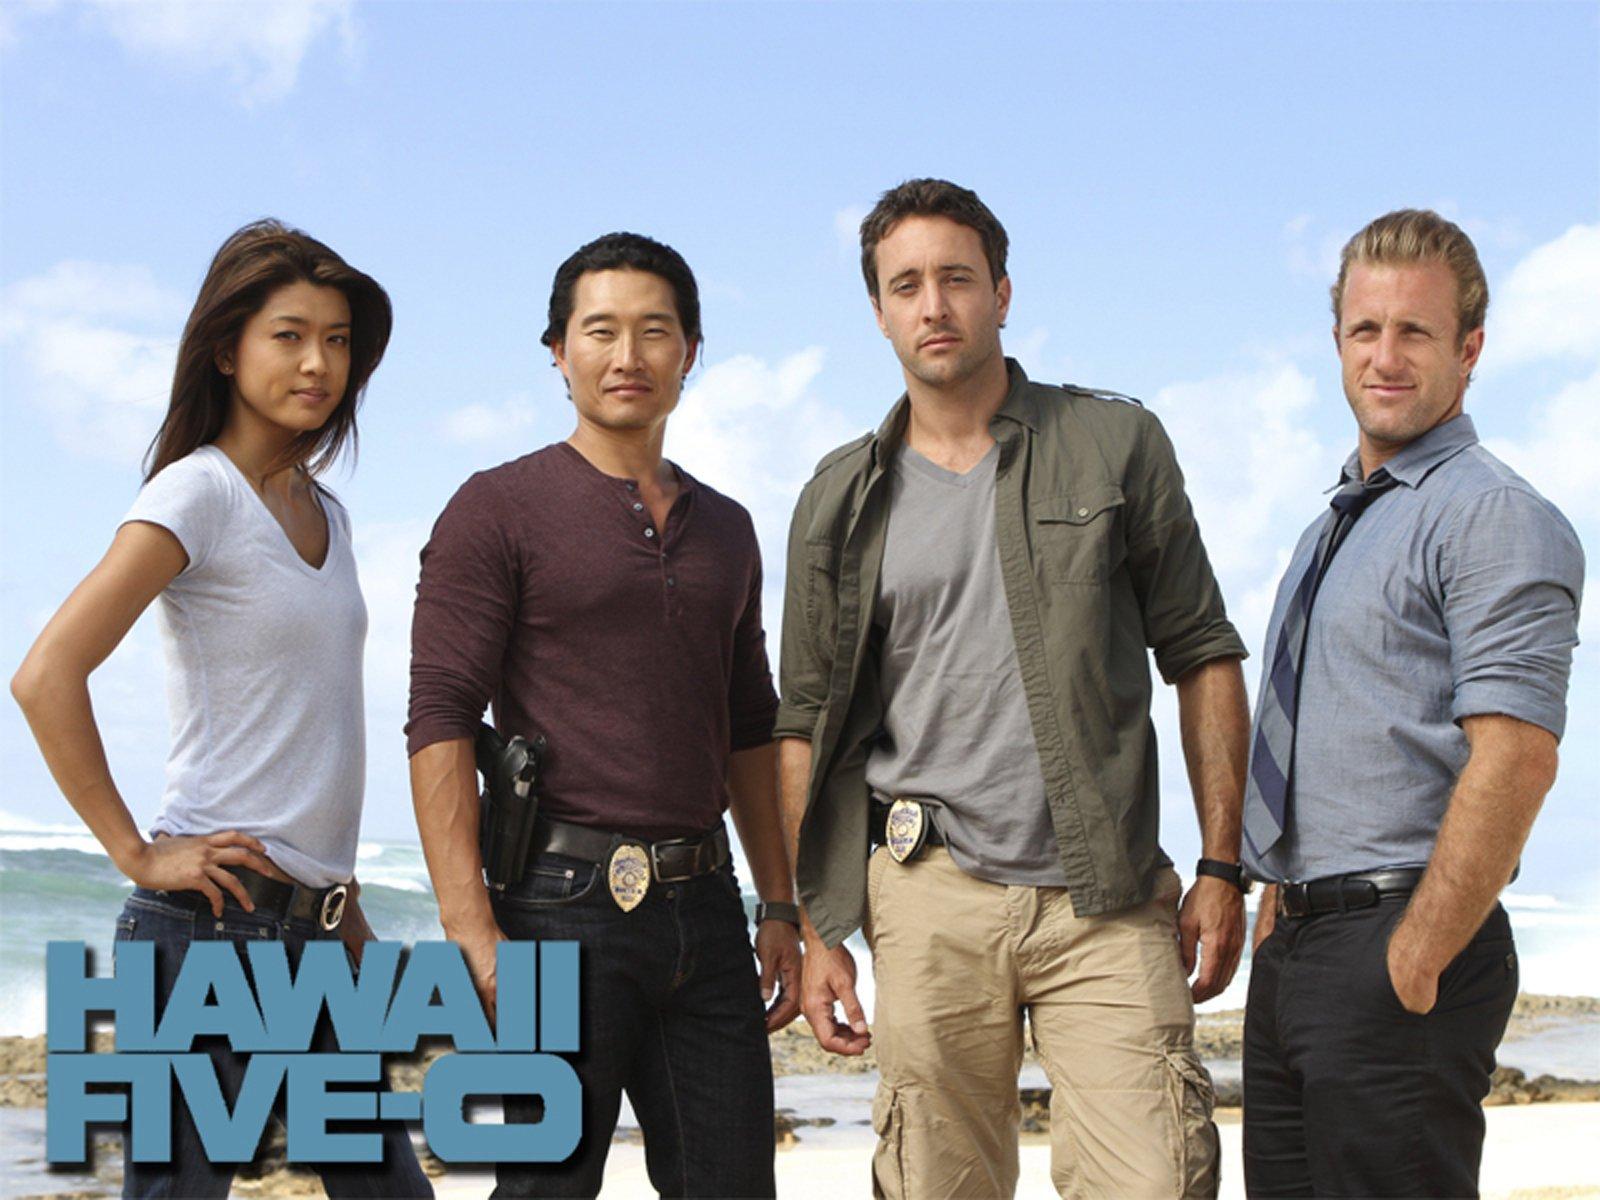 watch hawaii five o season 2 episode 10 online free